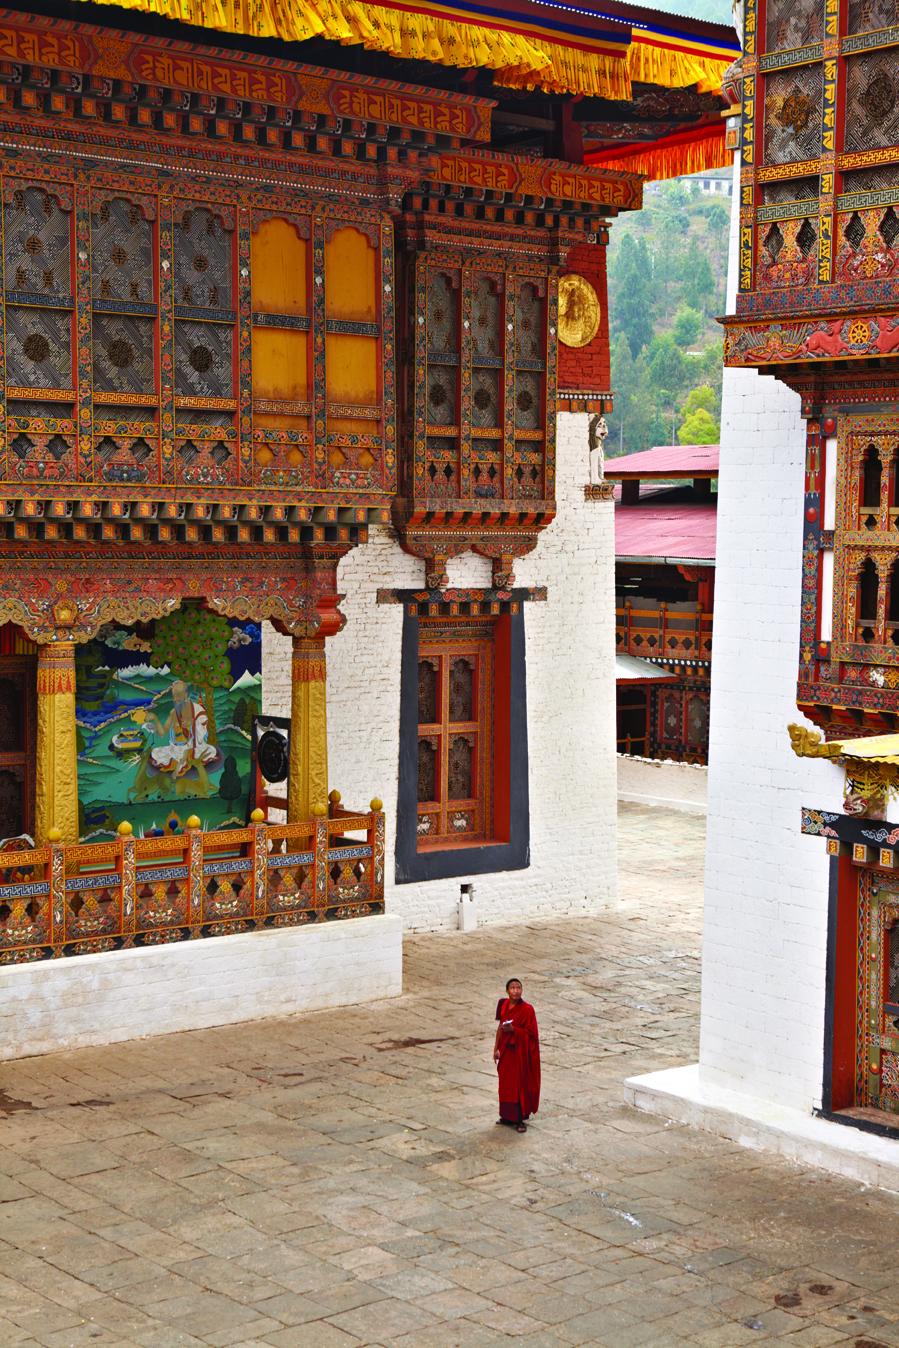 A courtyard at the grand Punakha Dzong.